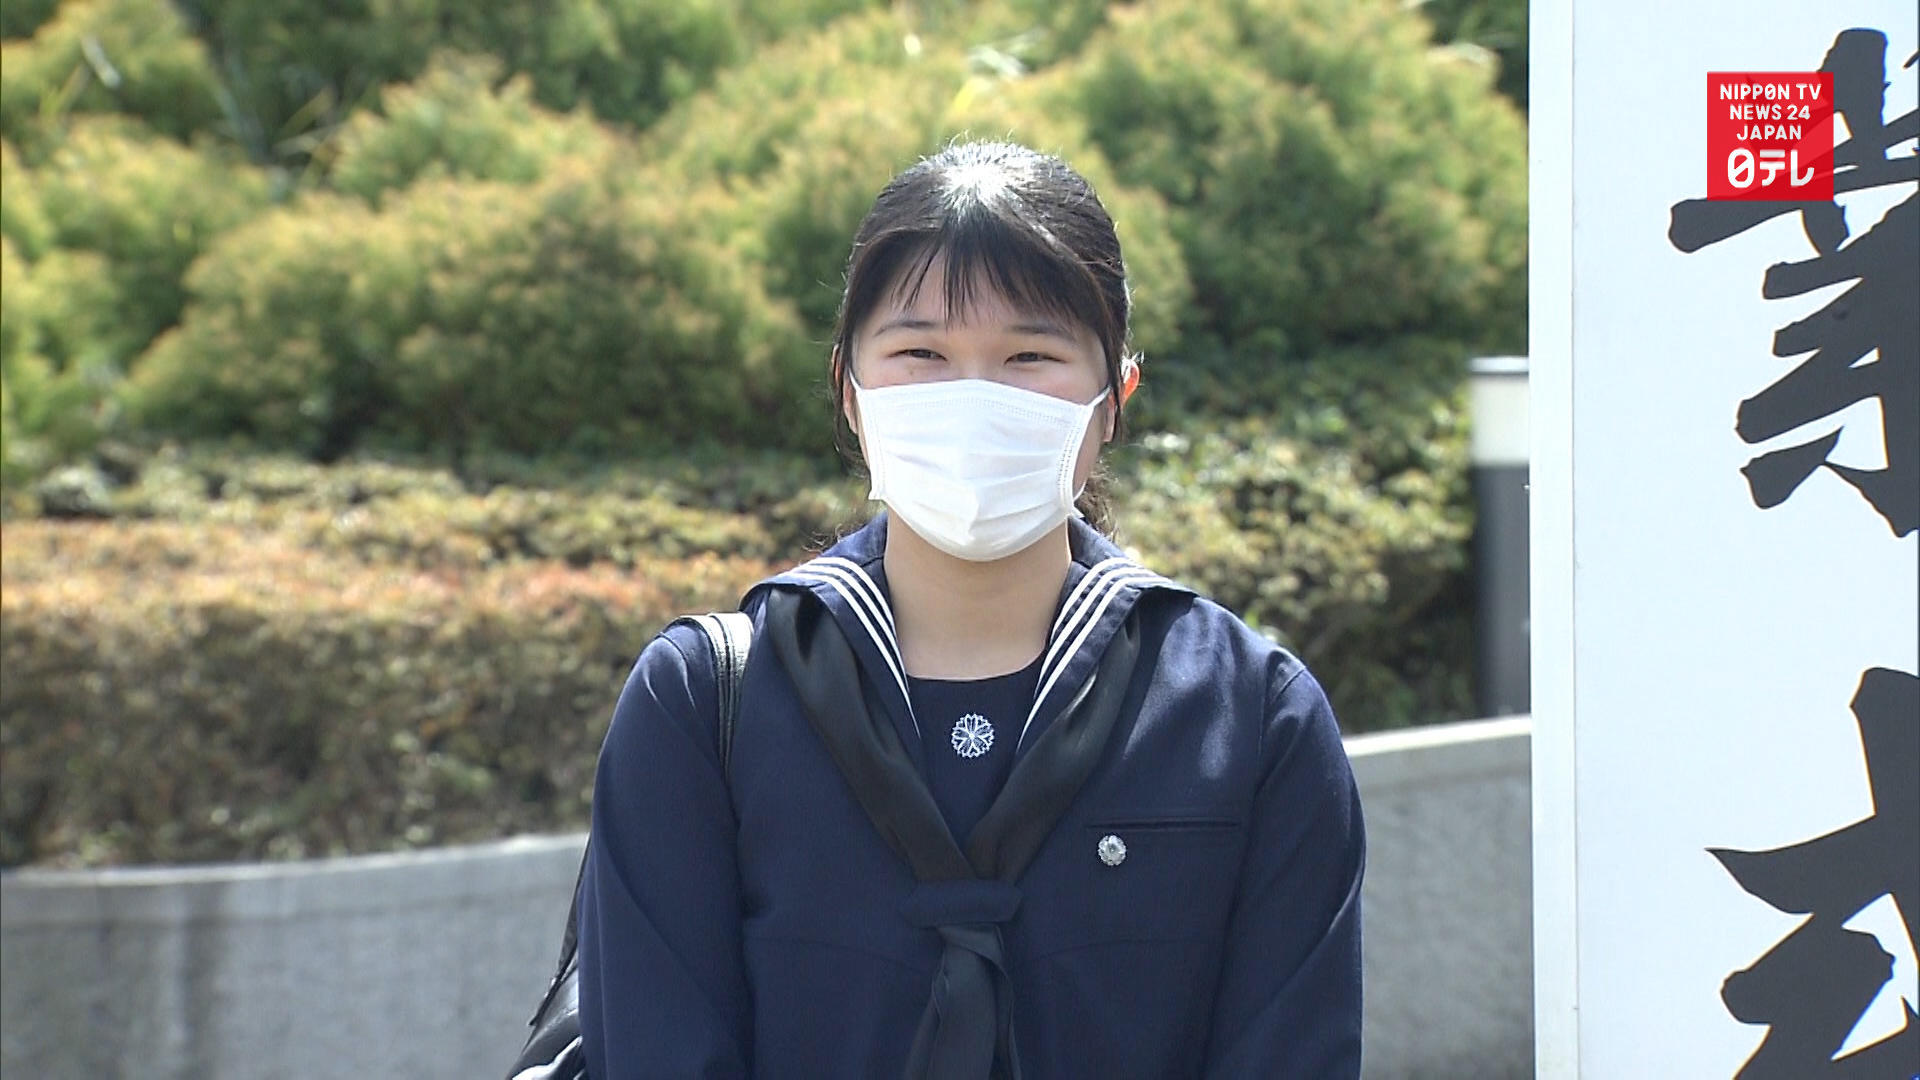 Princess Aiko graduates from high school